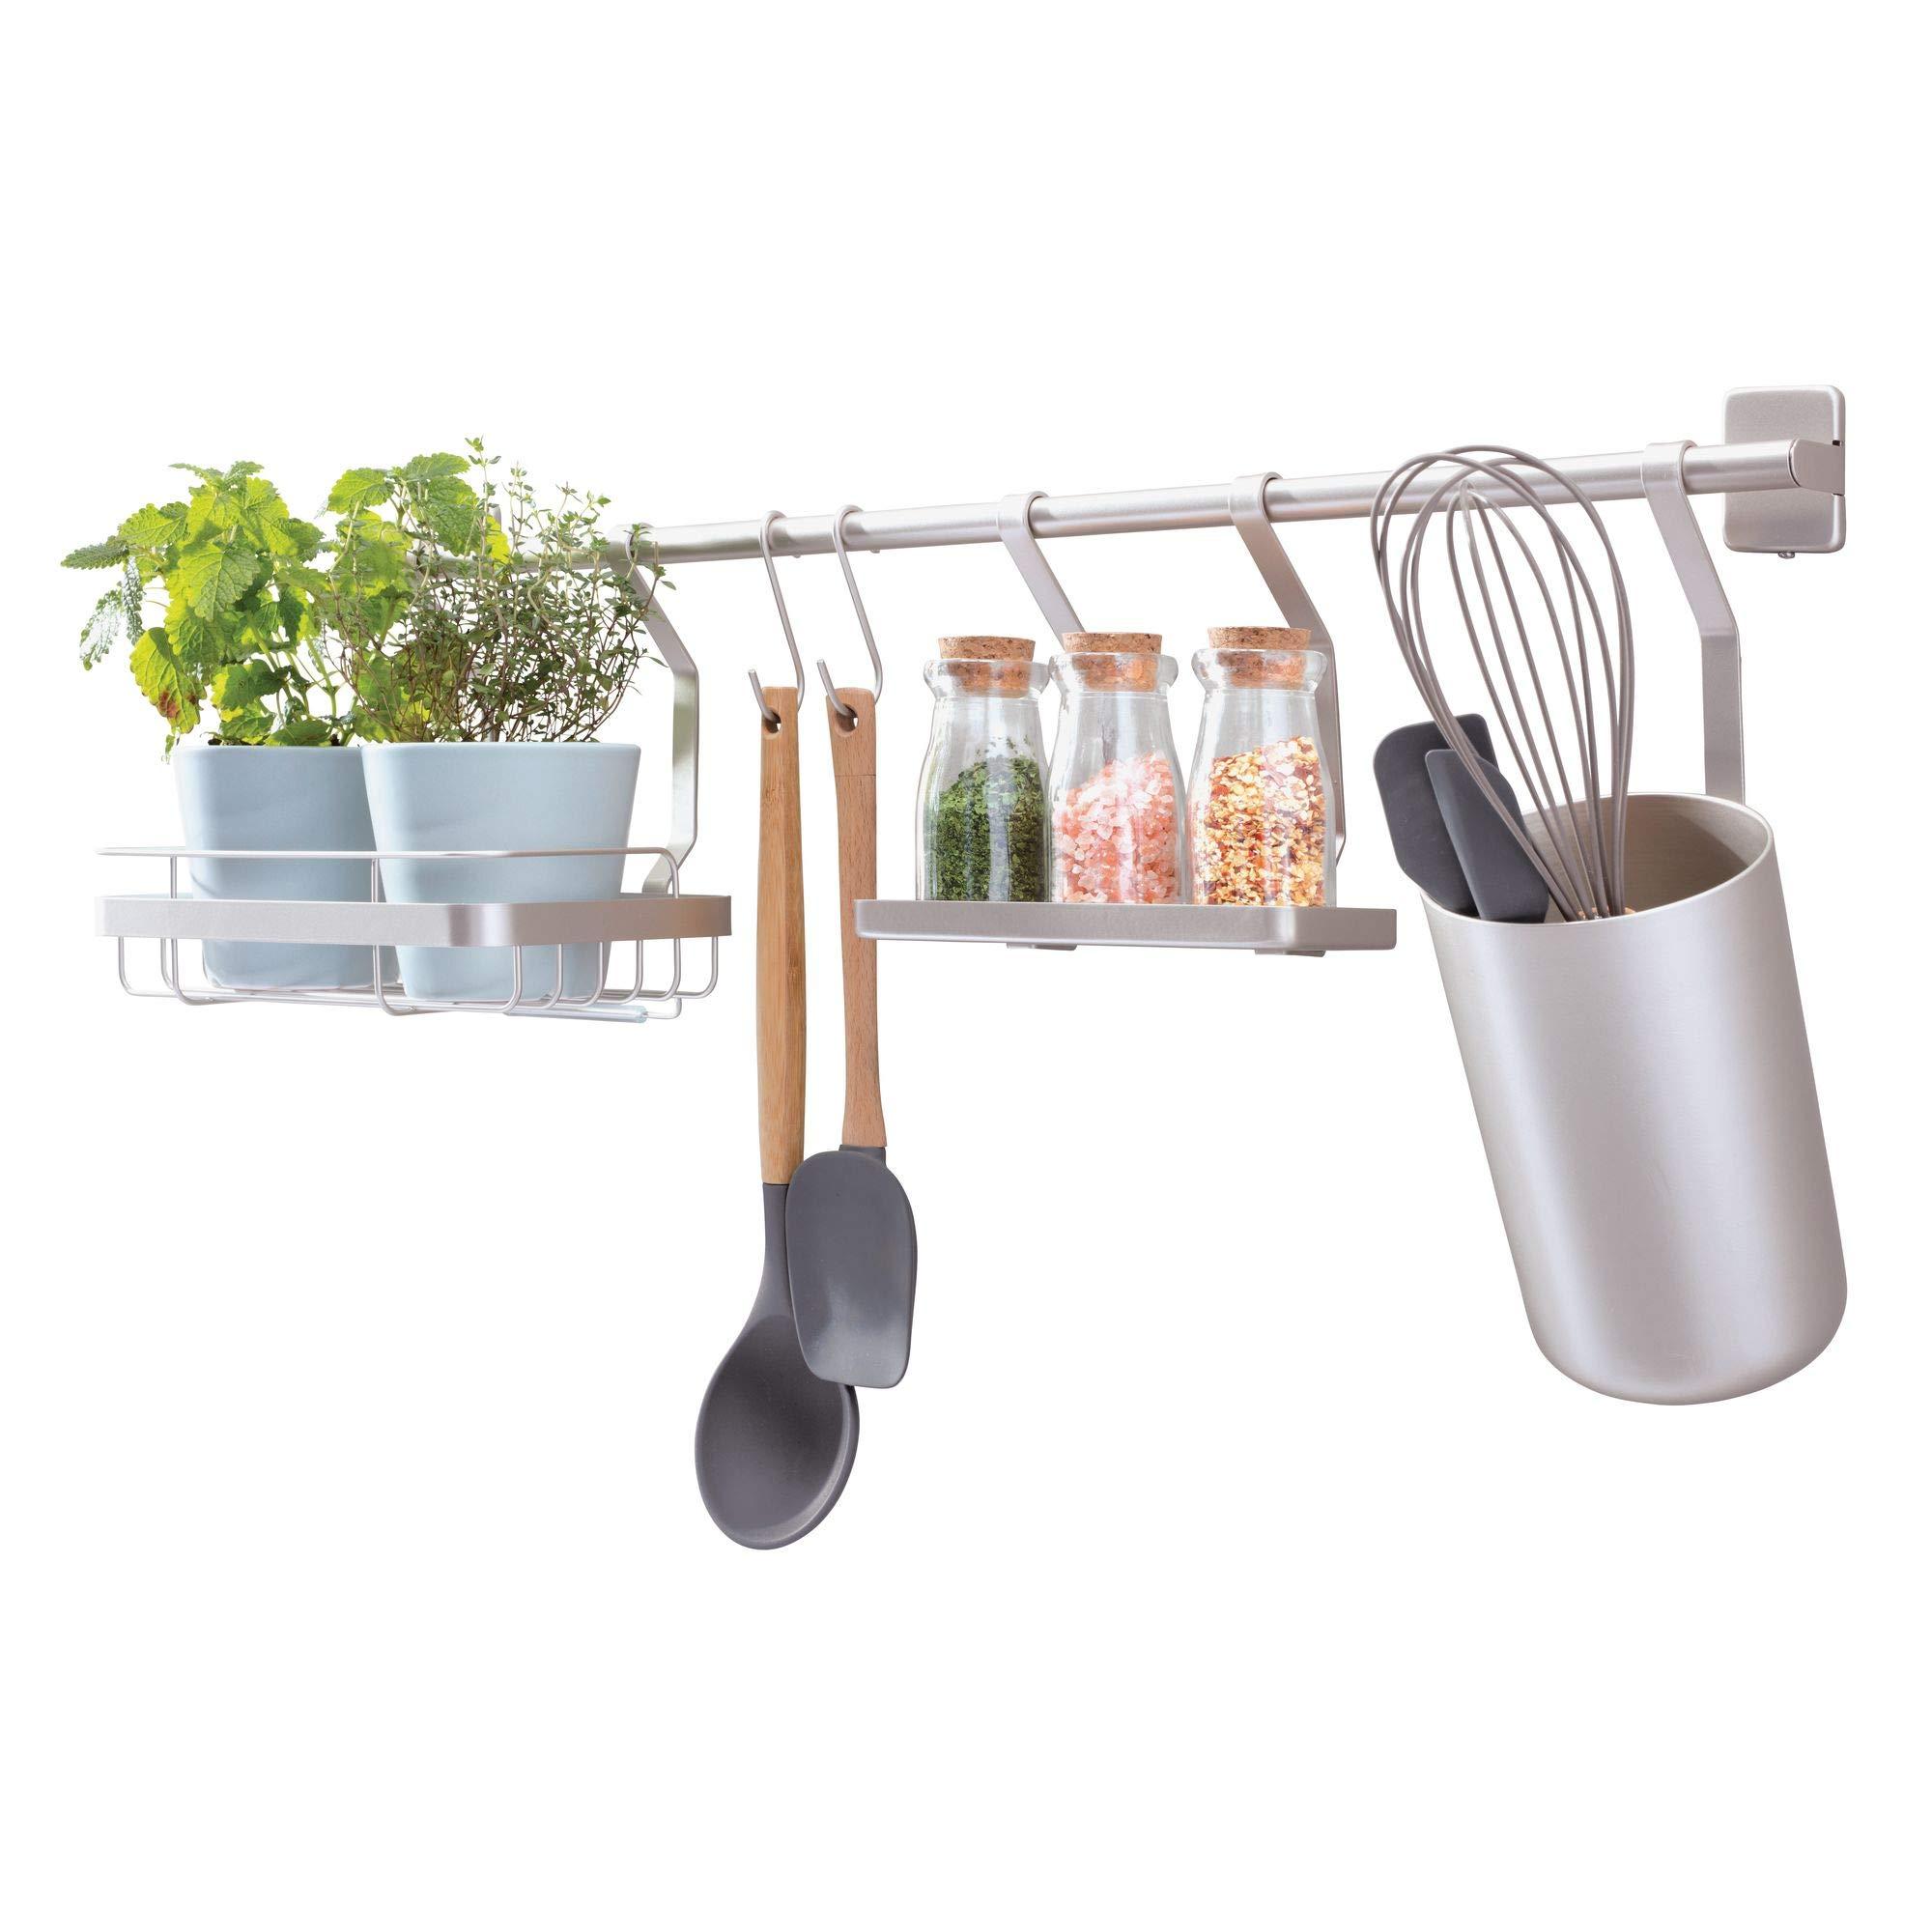 iDesign Austin Metal Wall Mount Kitchen Organizer for Spices, Utensils, Sponges, Soap, Matte Satin by iDesign